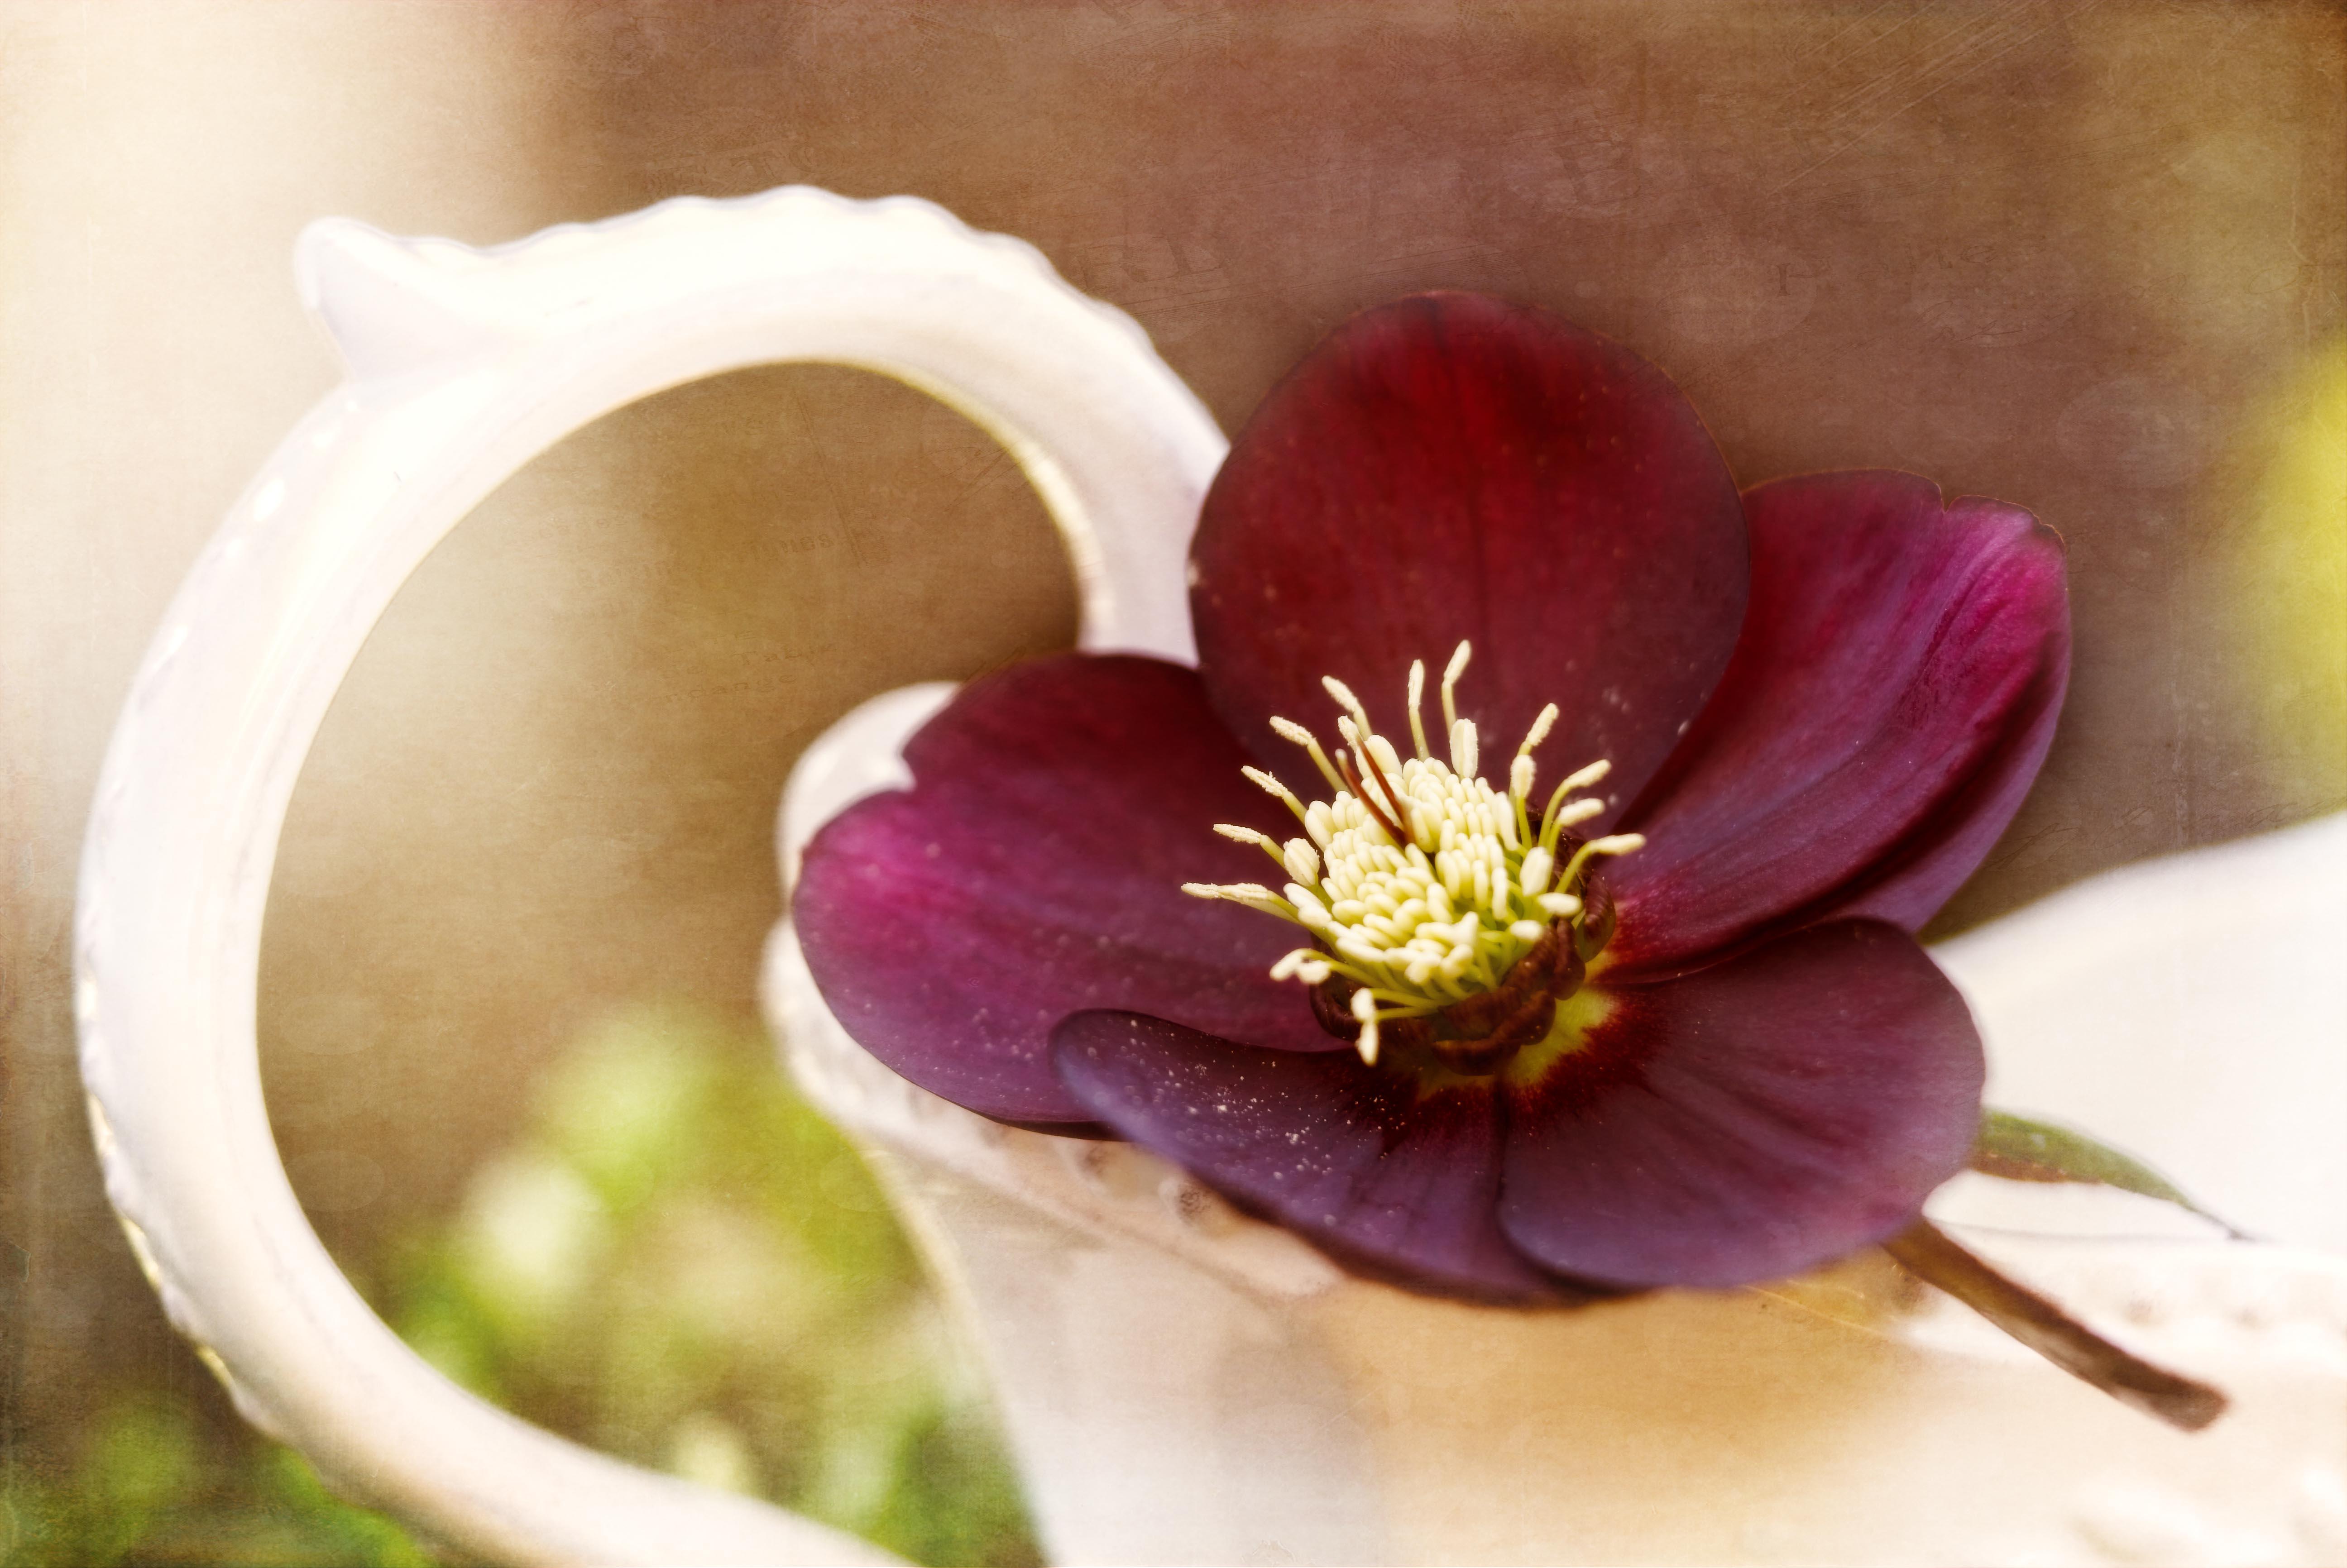 spring – Photo by Chris Kilpatrick